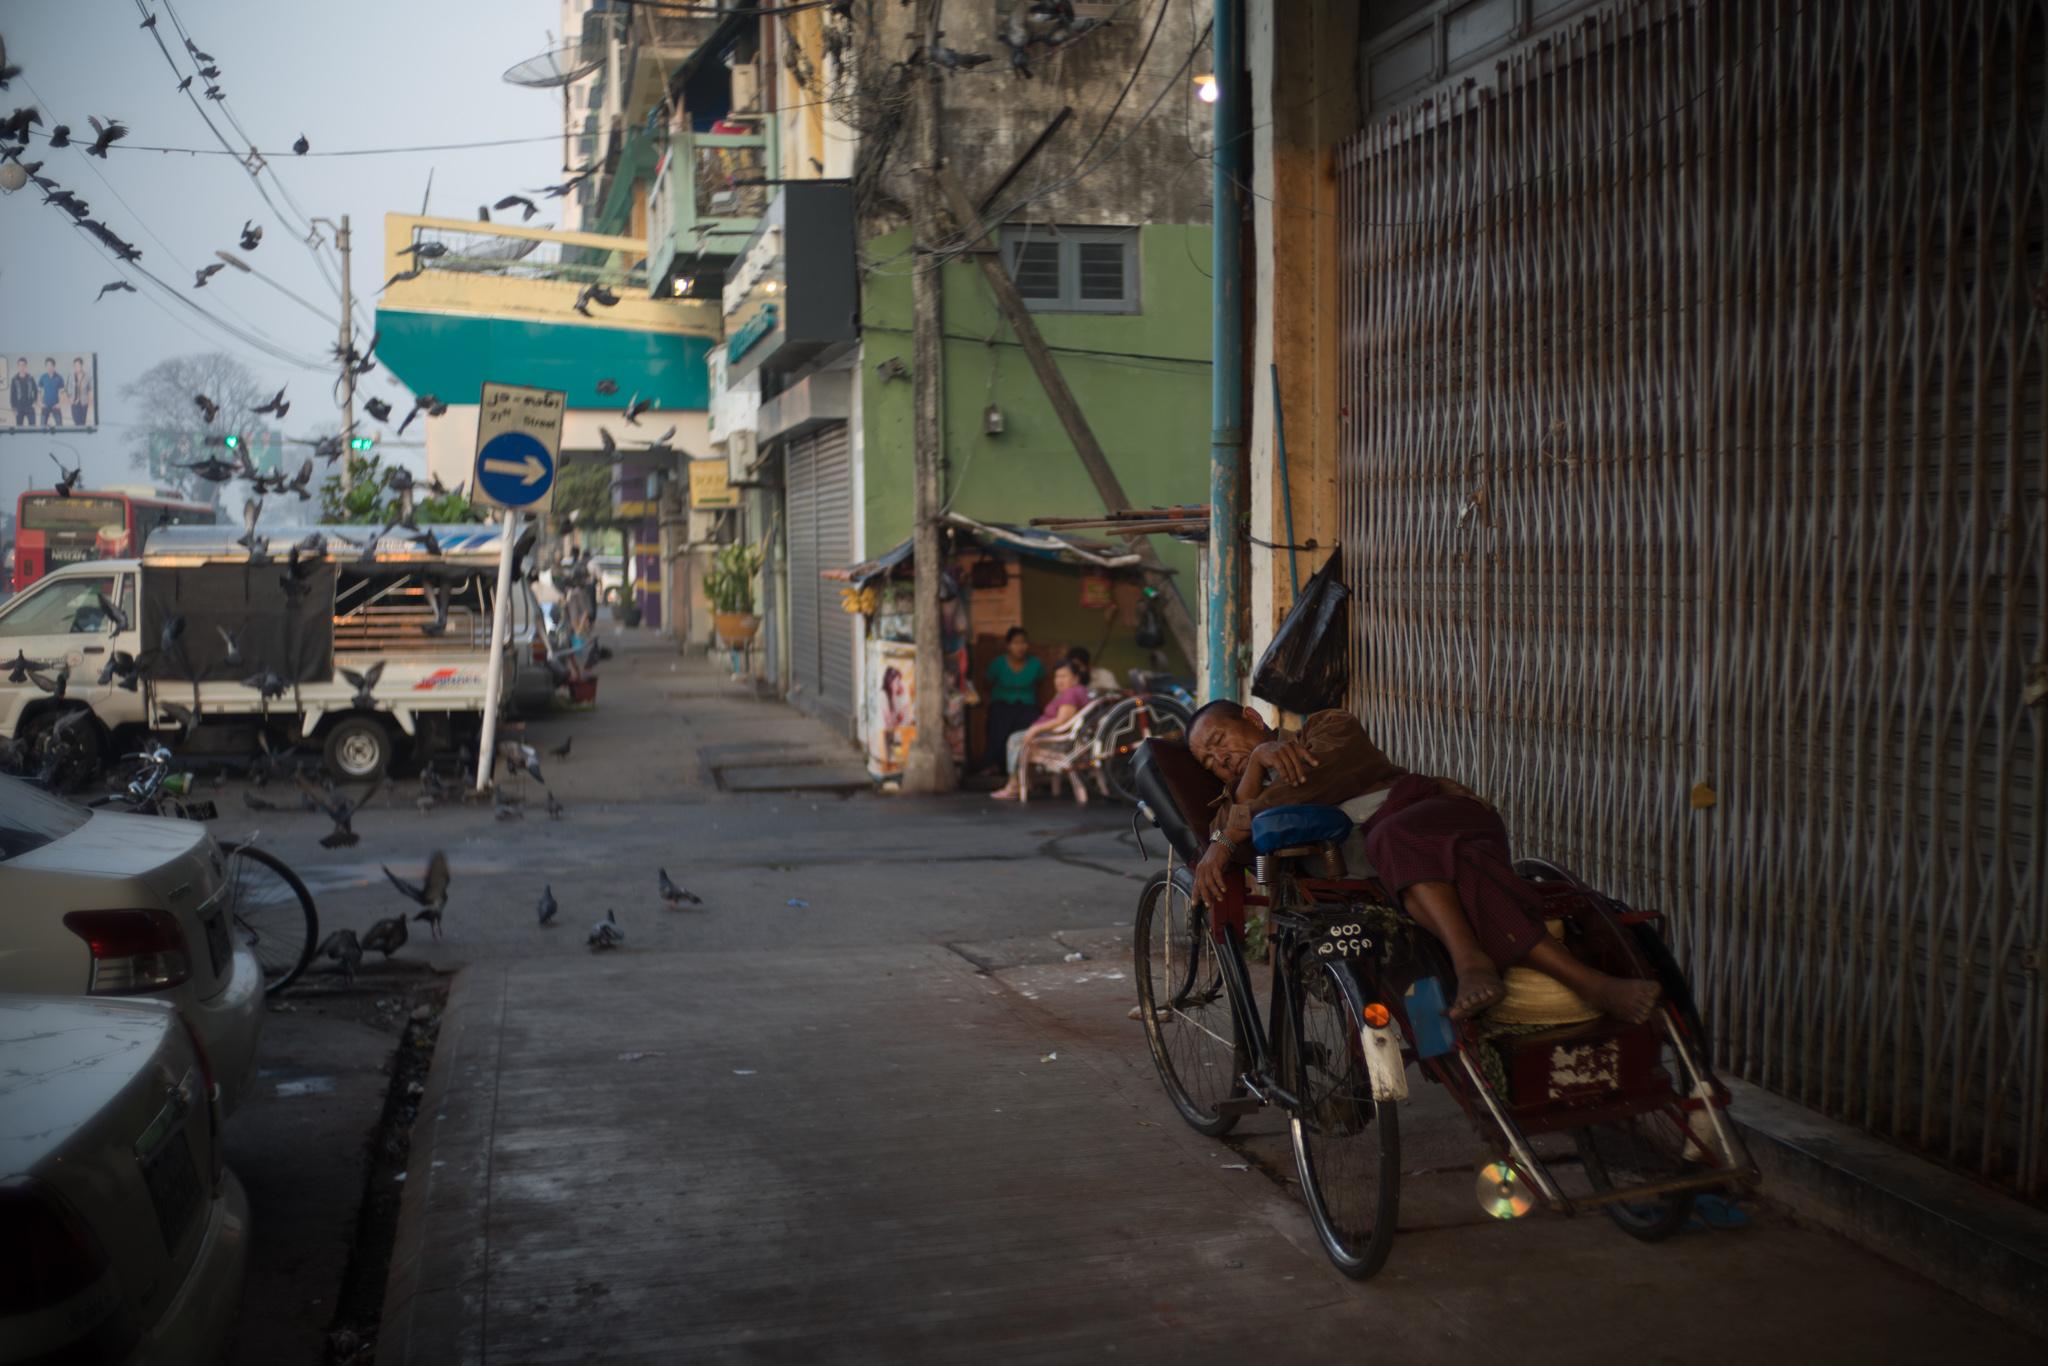 February 2016, Yangon (ရန်ကုန်), Myanmar (formerly Burma) (ပြည်ထောင်စုသမ္မတ မြန်မာနိုင်ငံတော်).